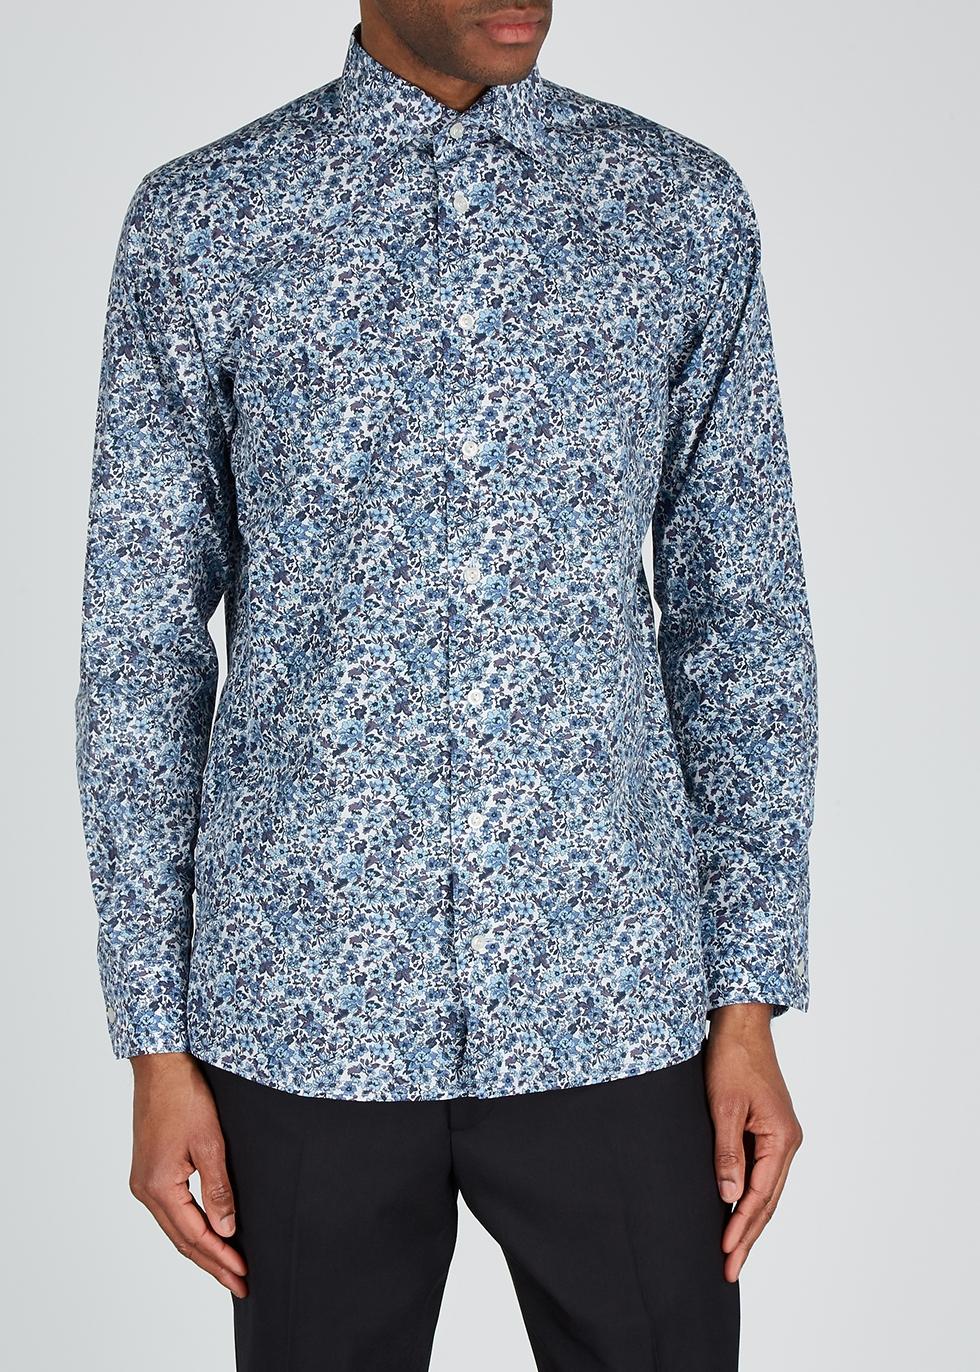 Contemporary floral-print cotton shirt - Eton